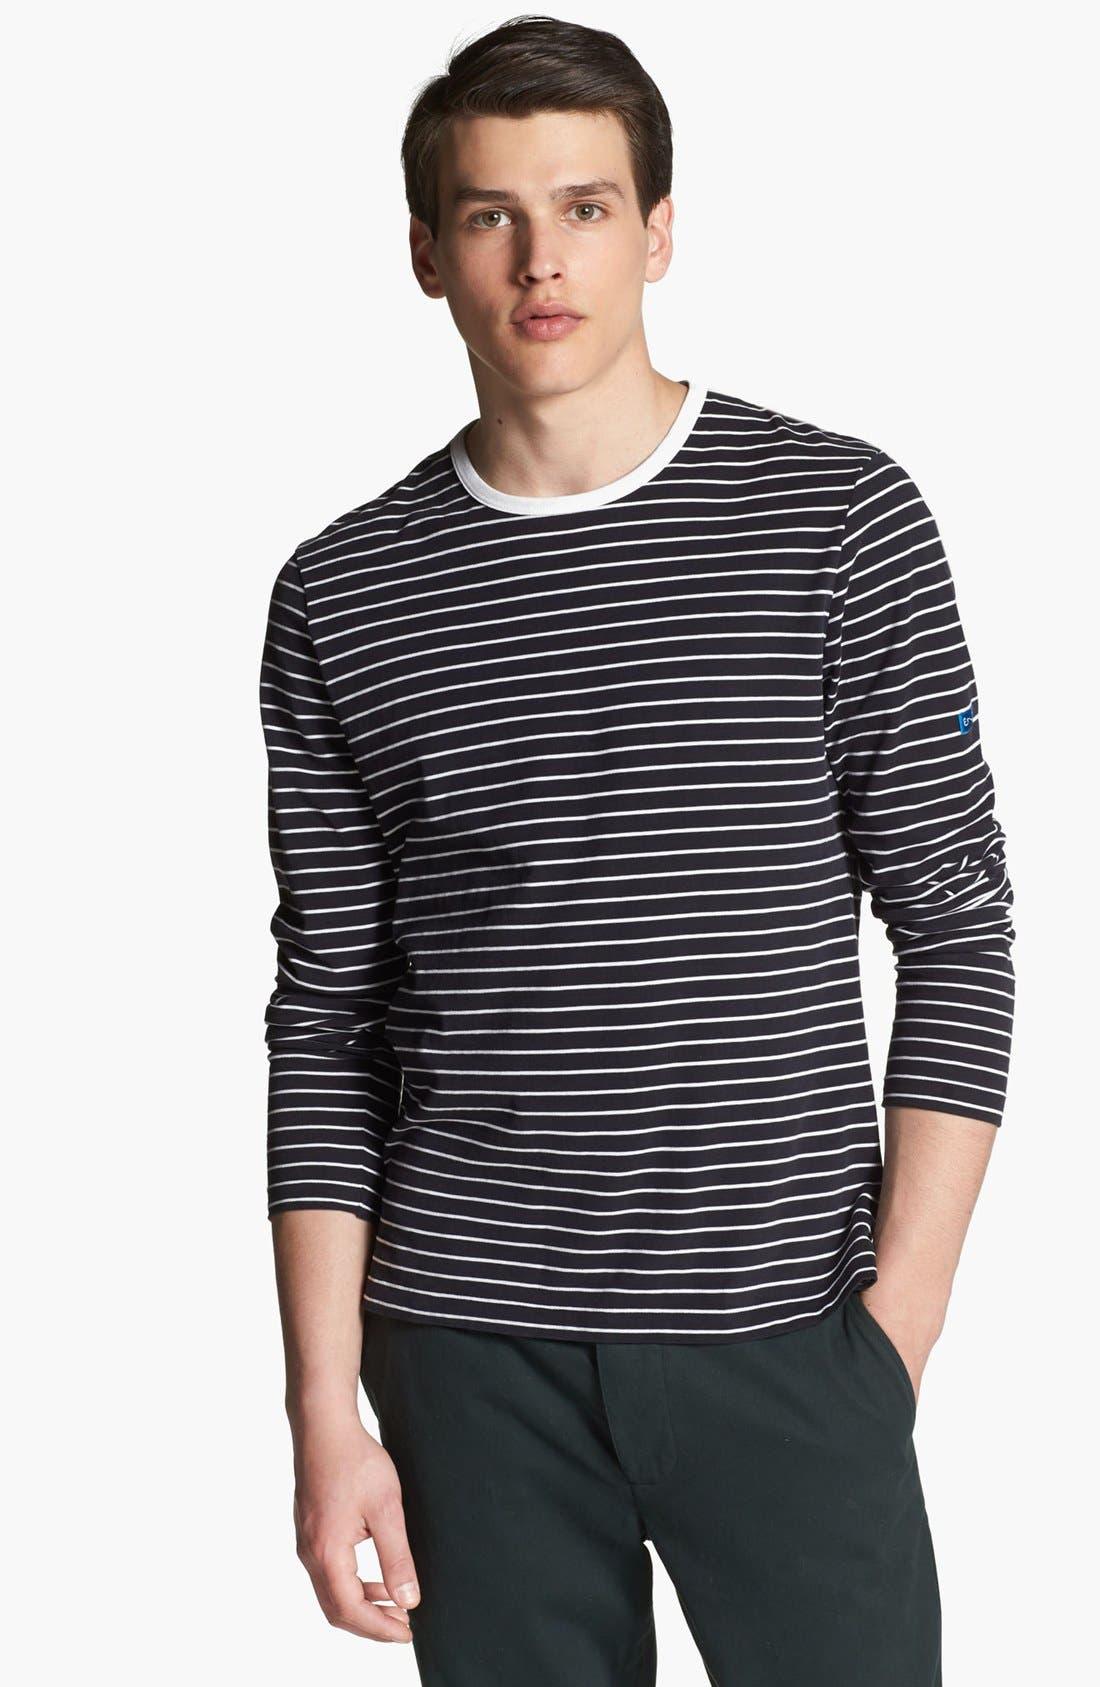 SHIPLEY & HALMOS, 'Spaniel' Stripe Long Sleeve T-Shirt, Main thumbnail 1, color, 414